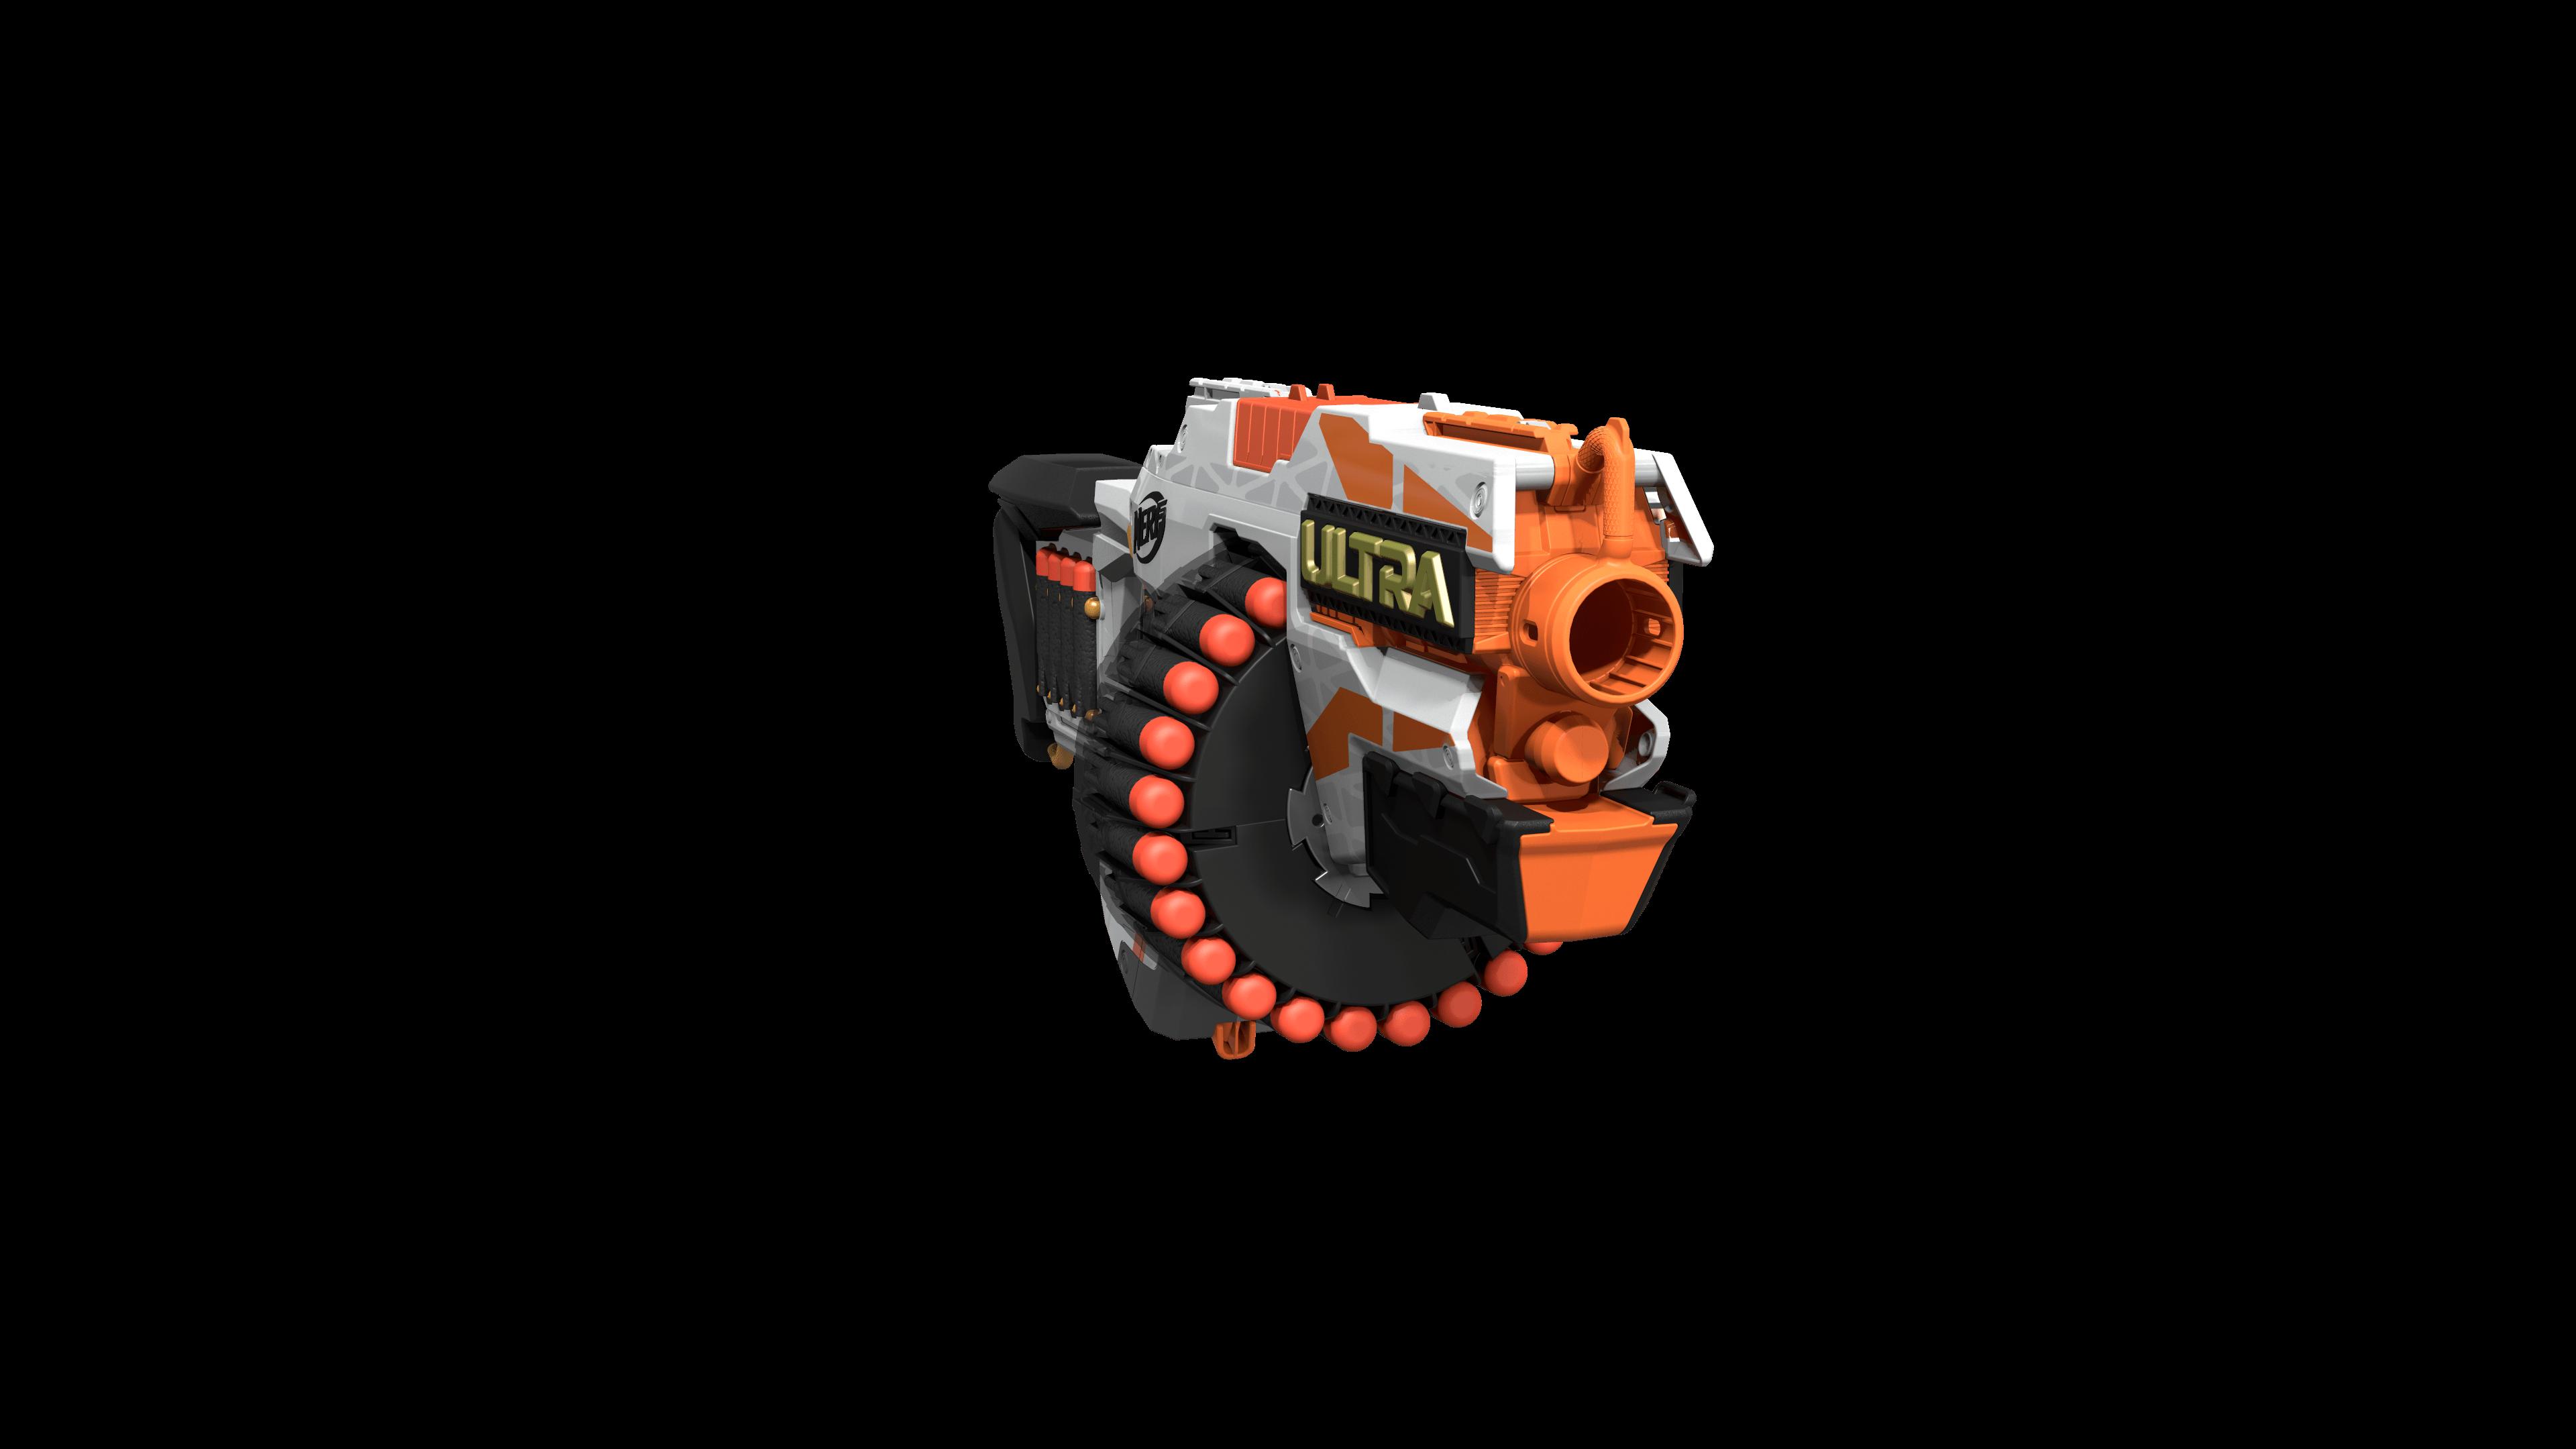 ultra blaster img 99